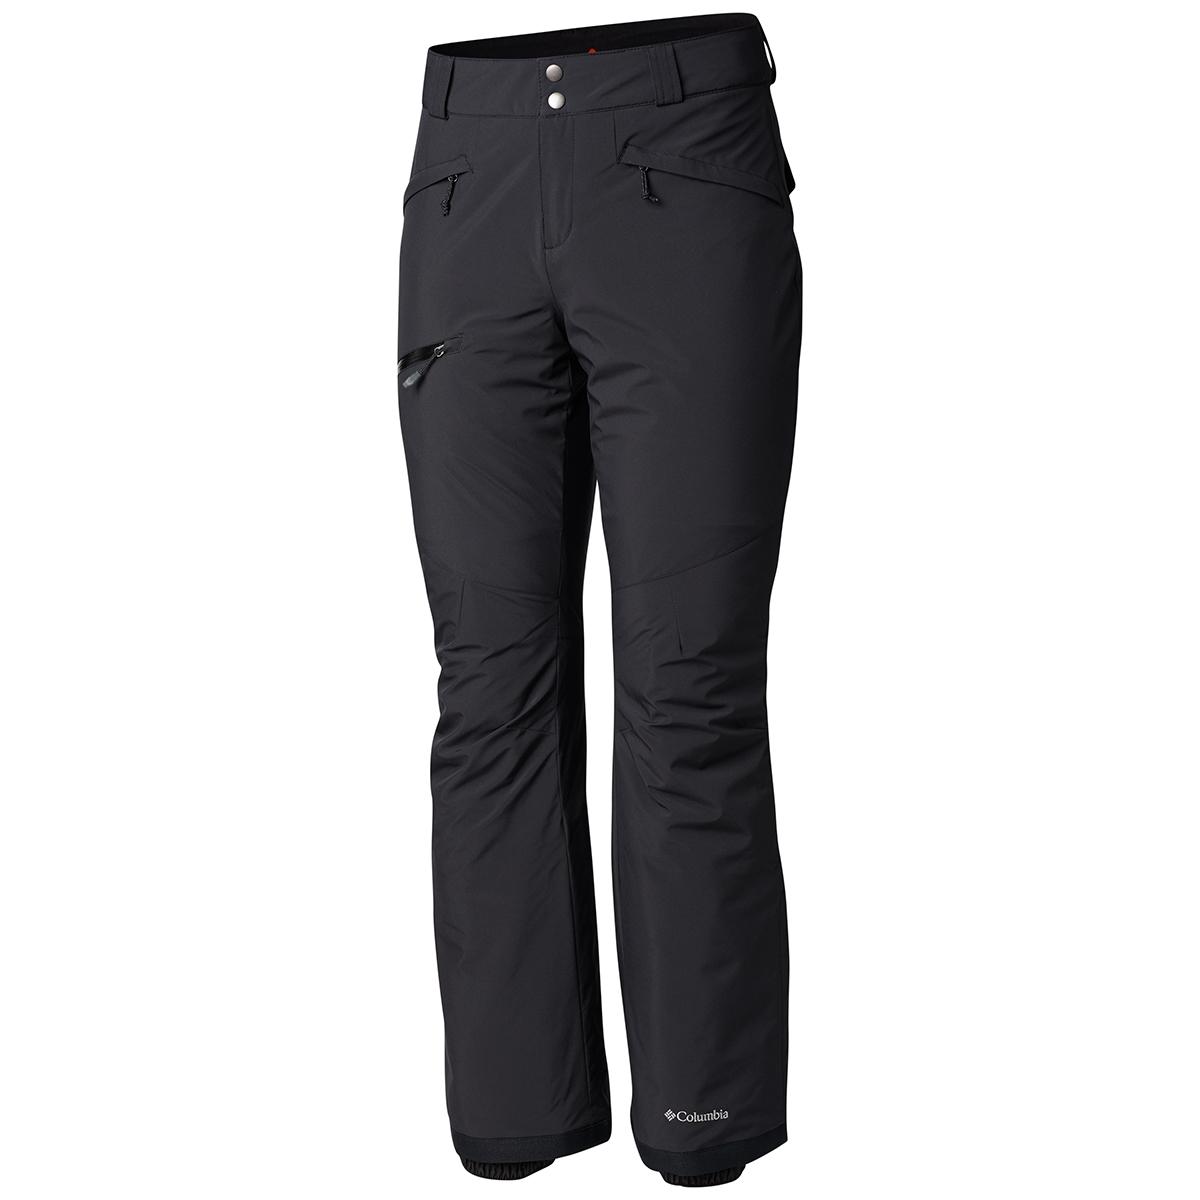 Columbia Women's Wildside Pant - Black, XS